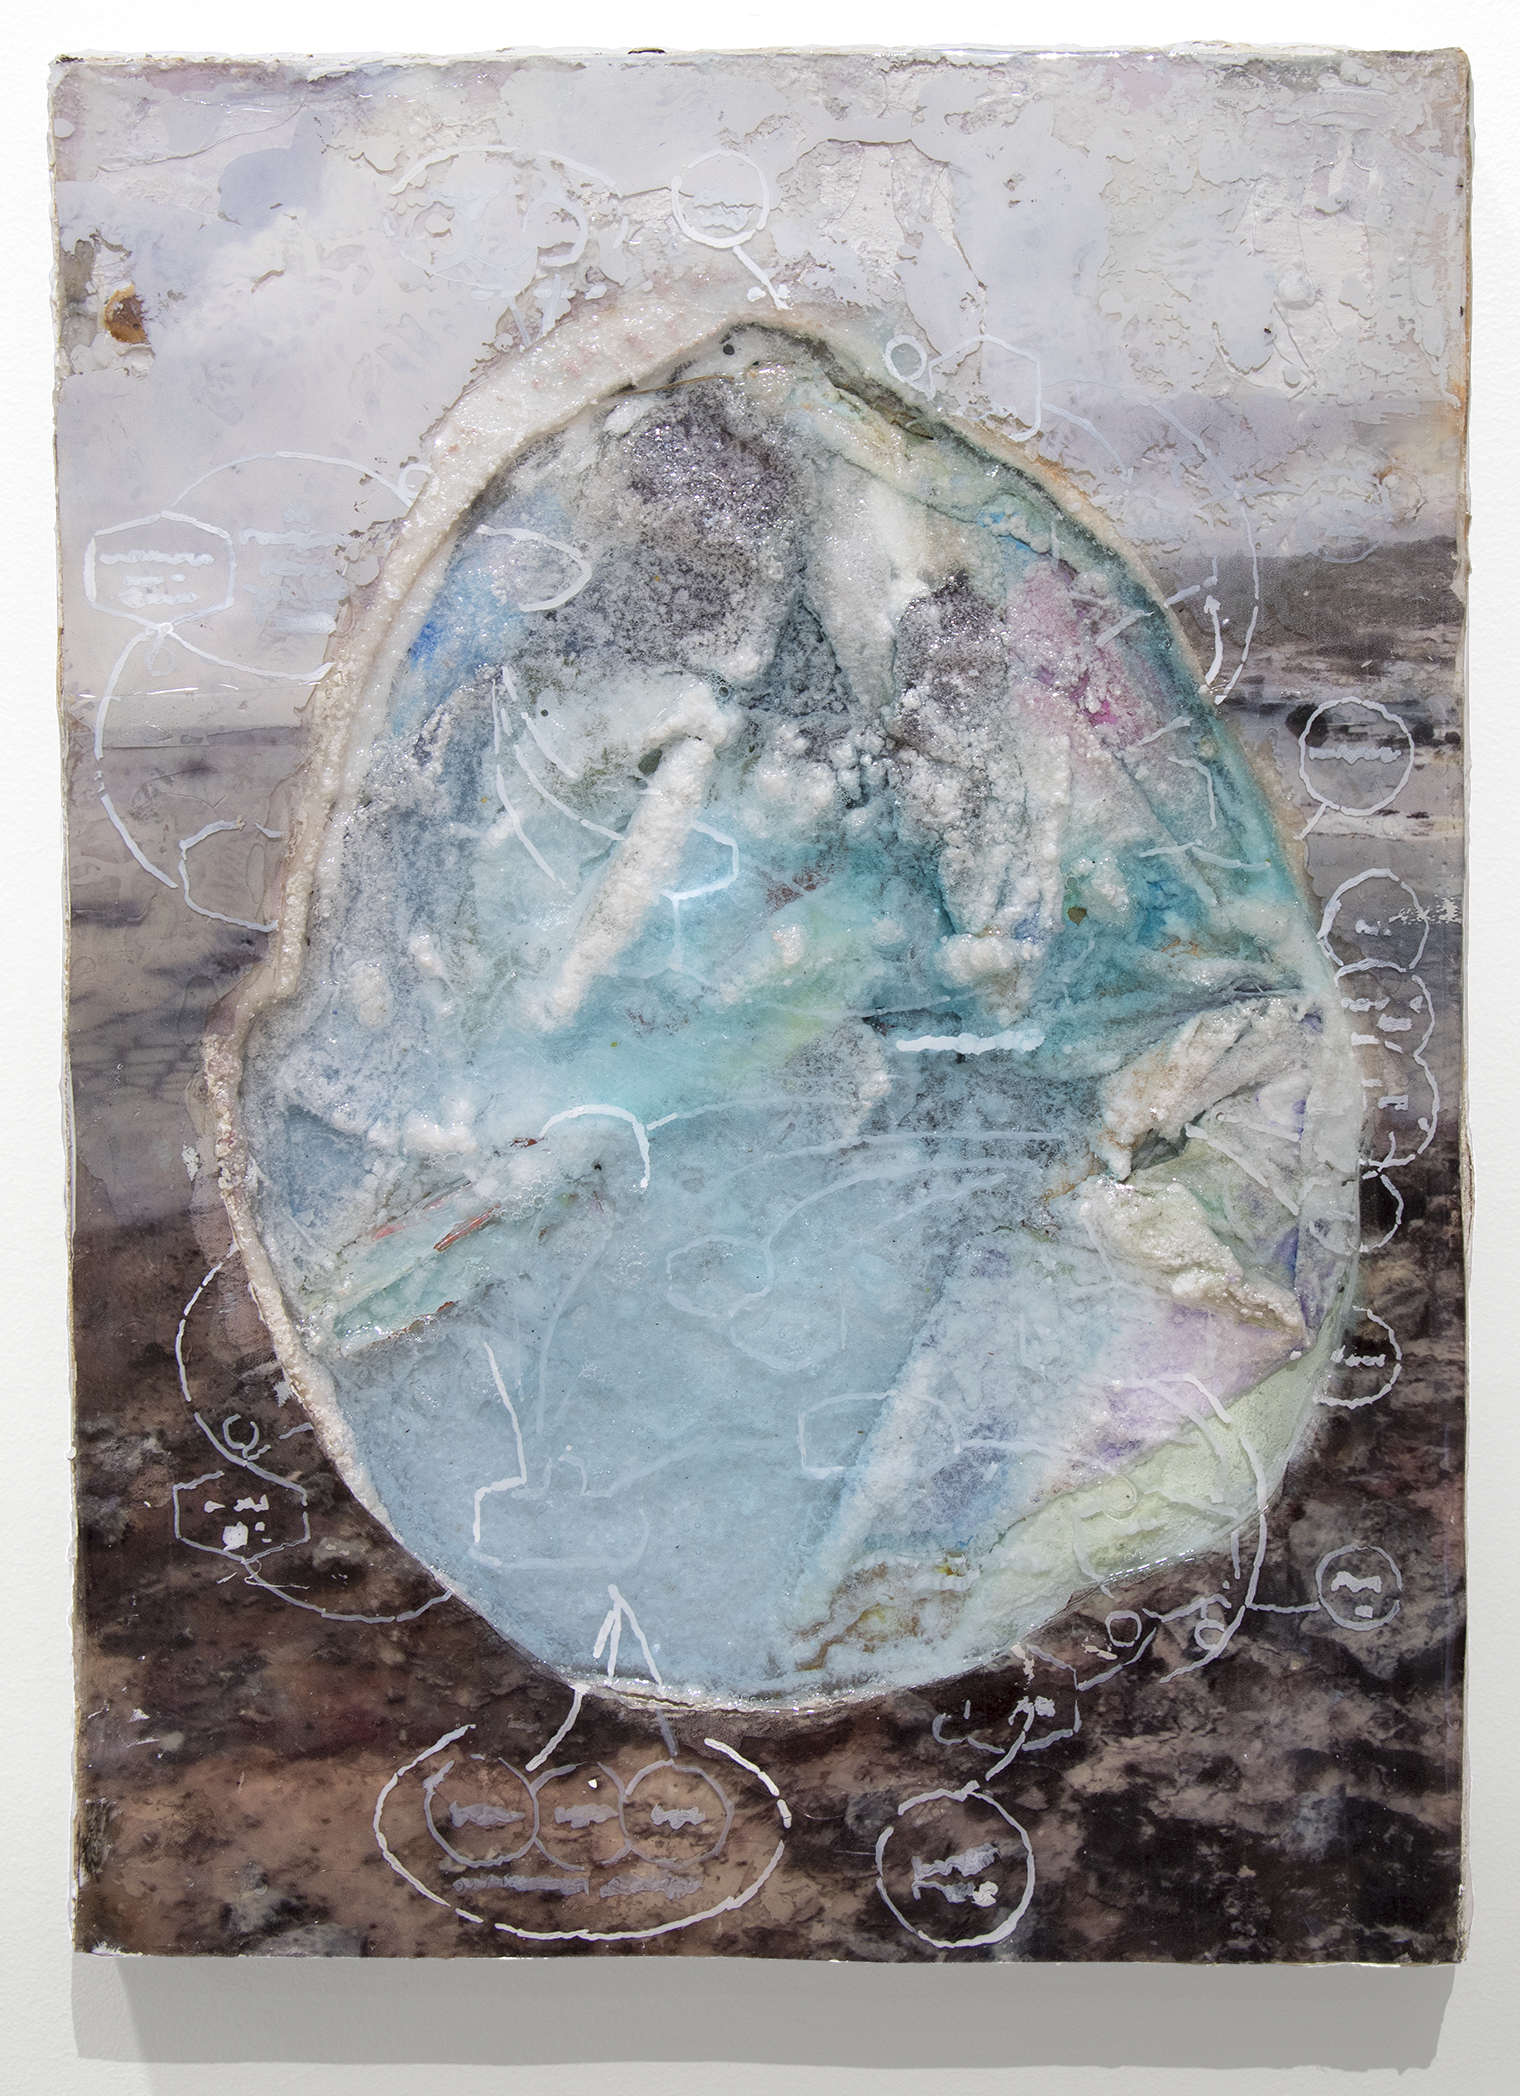 "Terme . Ink, acrylic, salt crystals, inkjet transparencies, epoxy resin on panel. 9x12"". 2017"